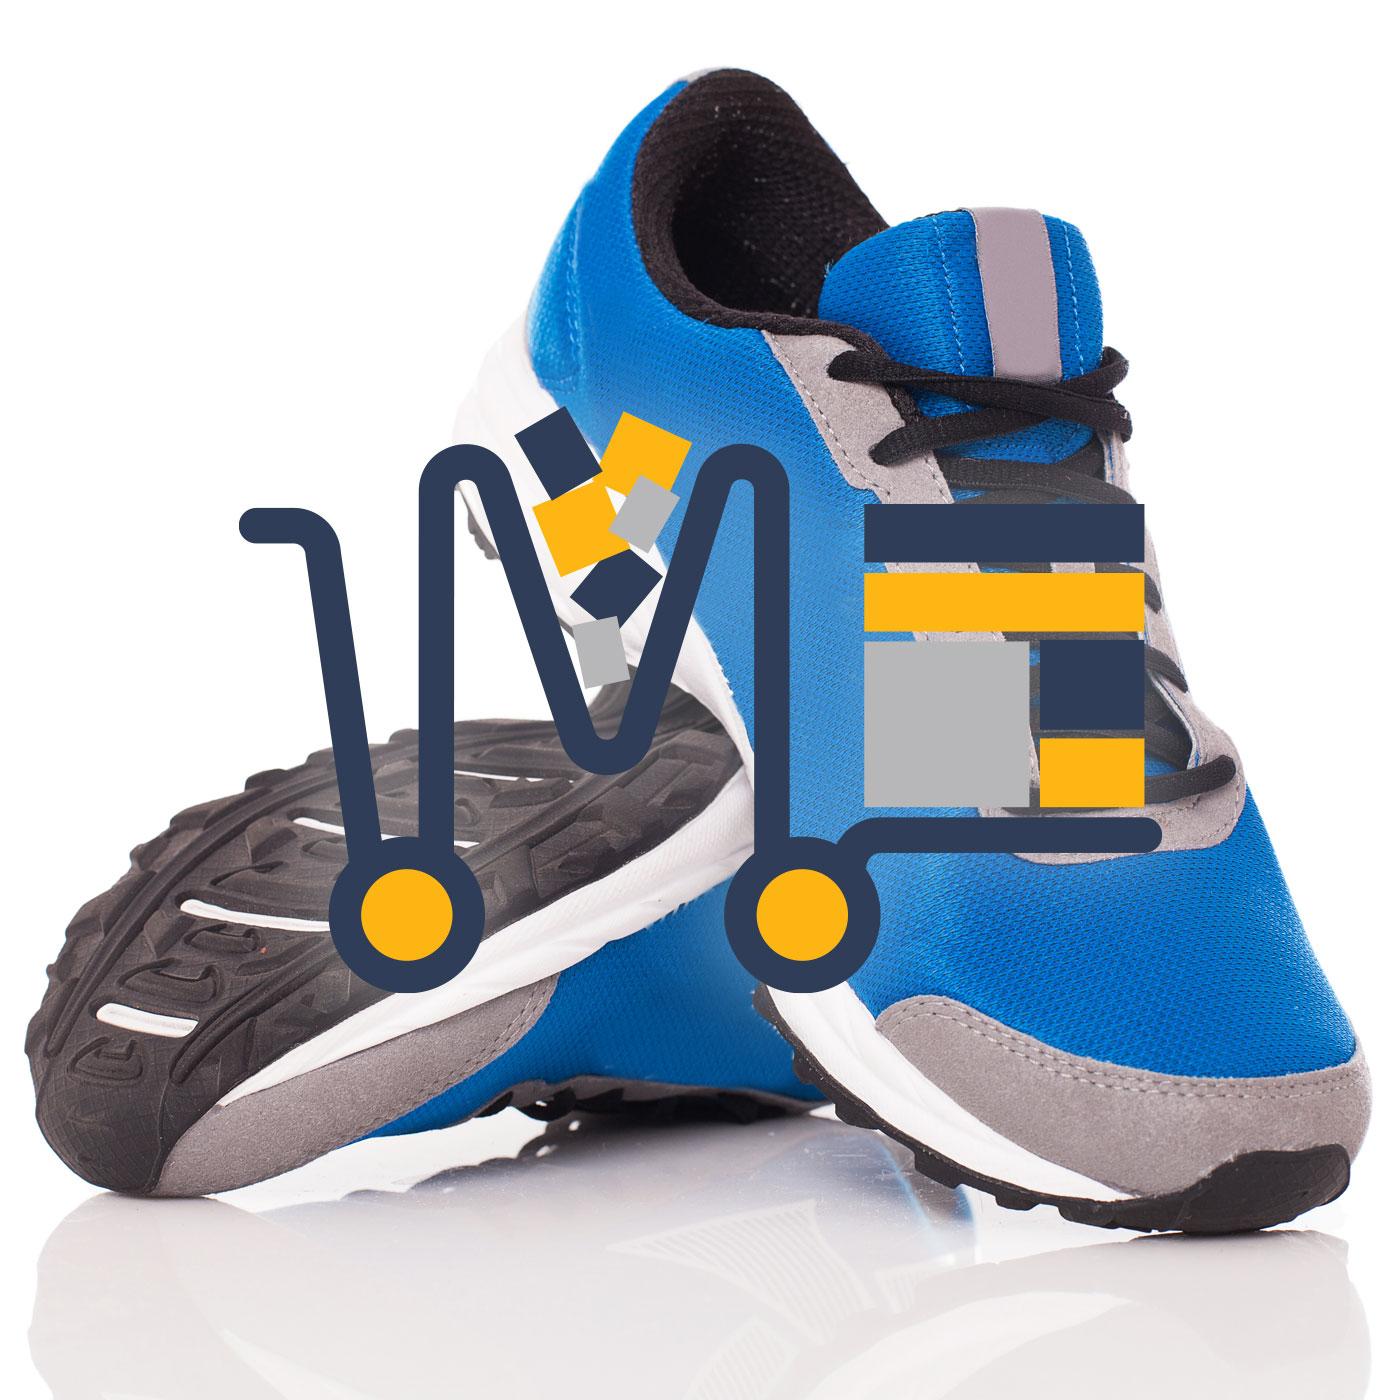 demo_marketor_blue_sneakers_2.jpg